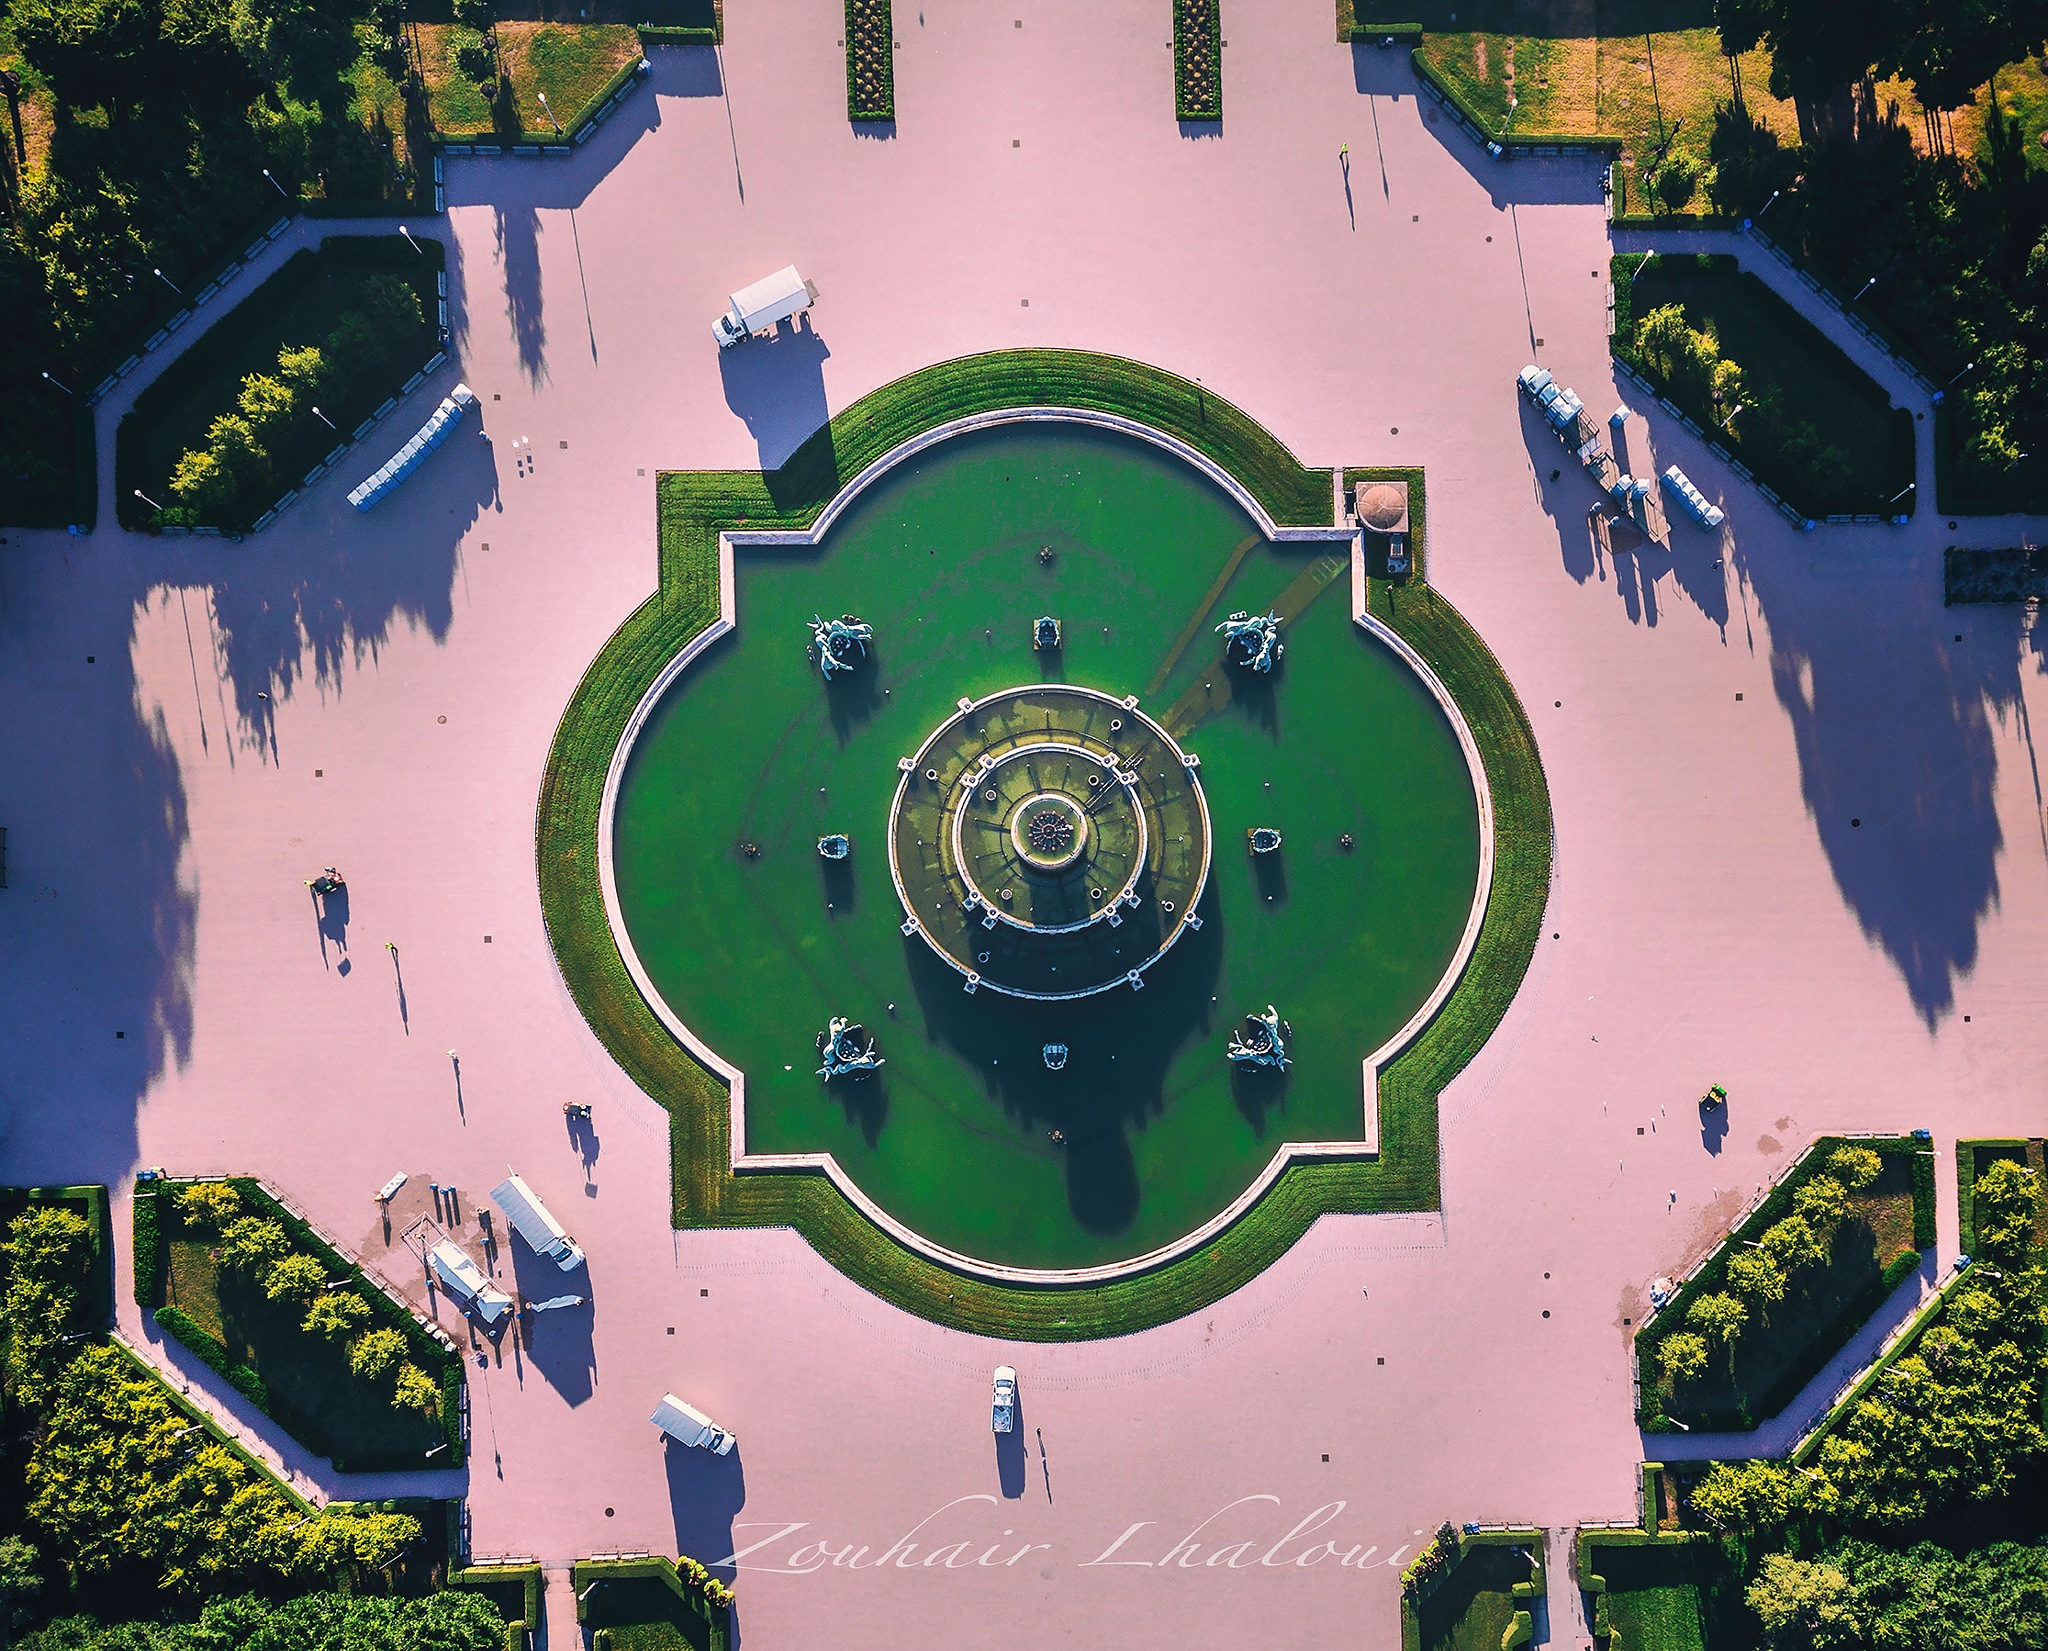 Buckingham fountain by Zouhair Lhaloui